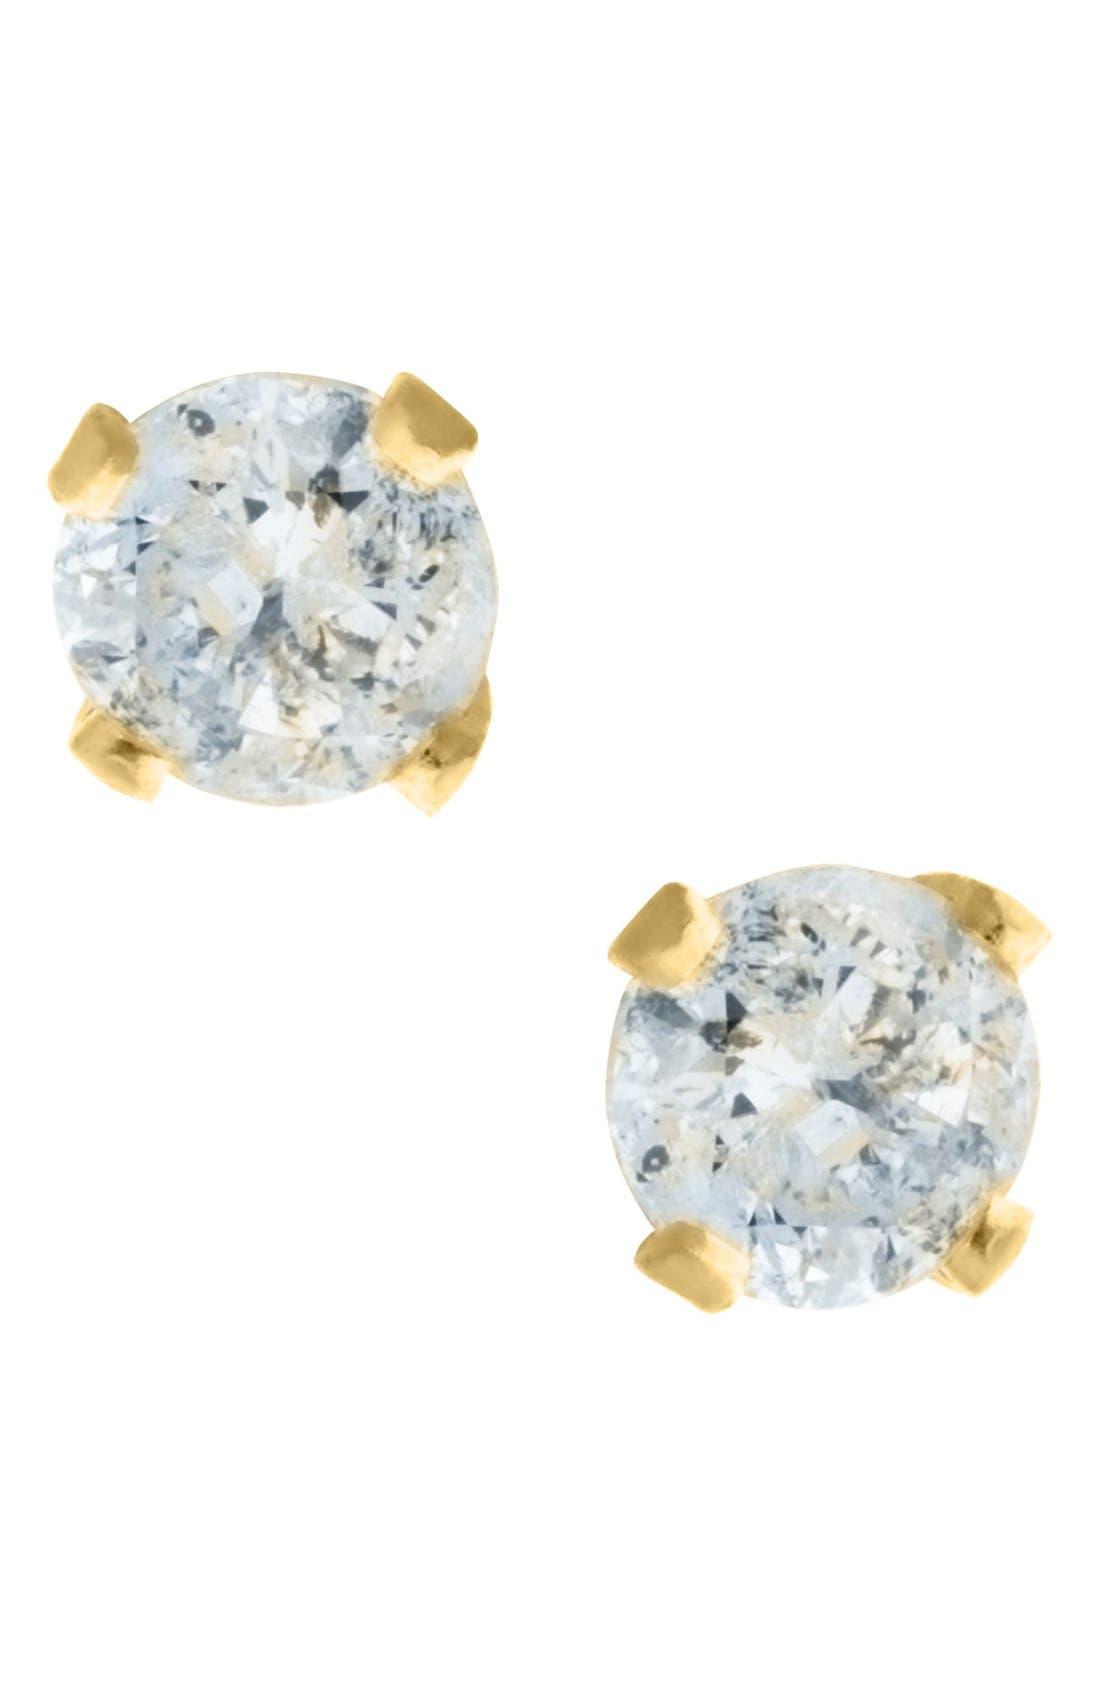 14k Yellow Gold & Diamond Stud Earrings,                             Main thumbnail 1, color,                             Gold